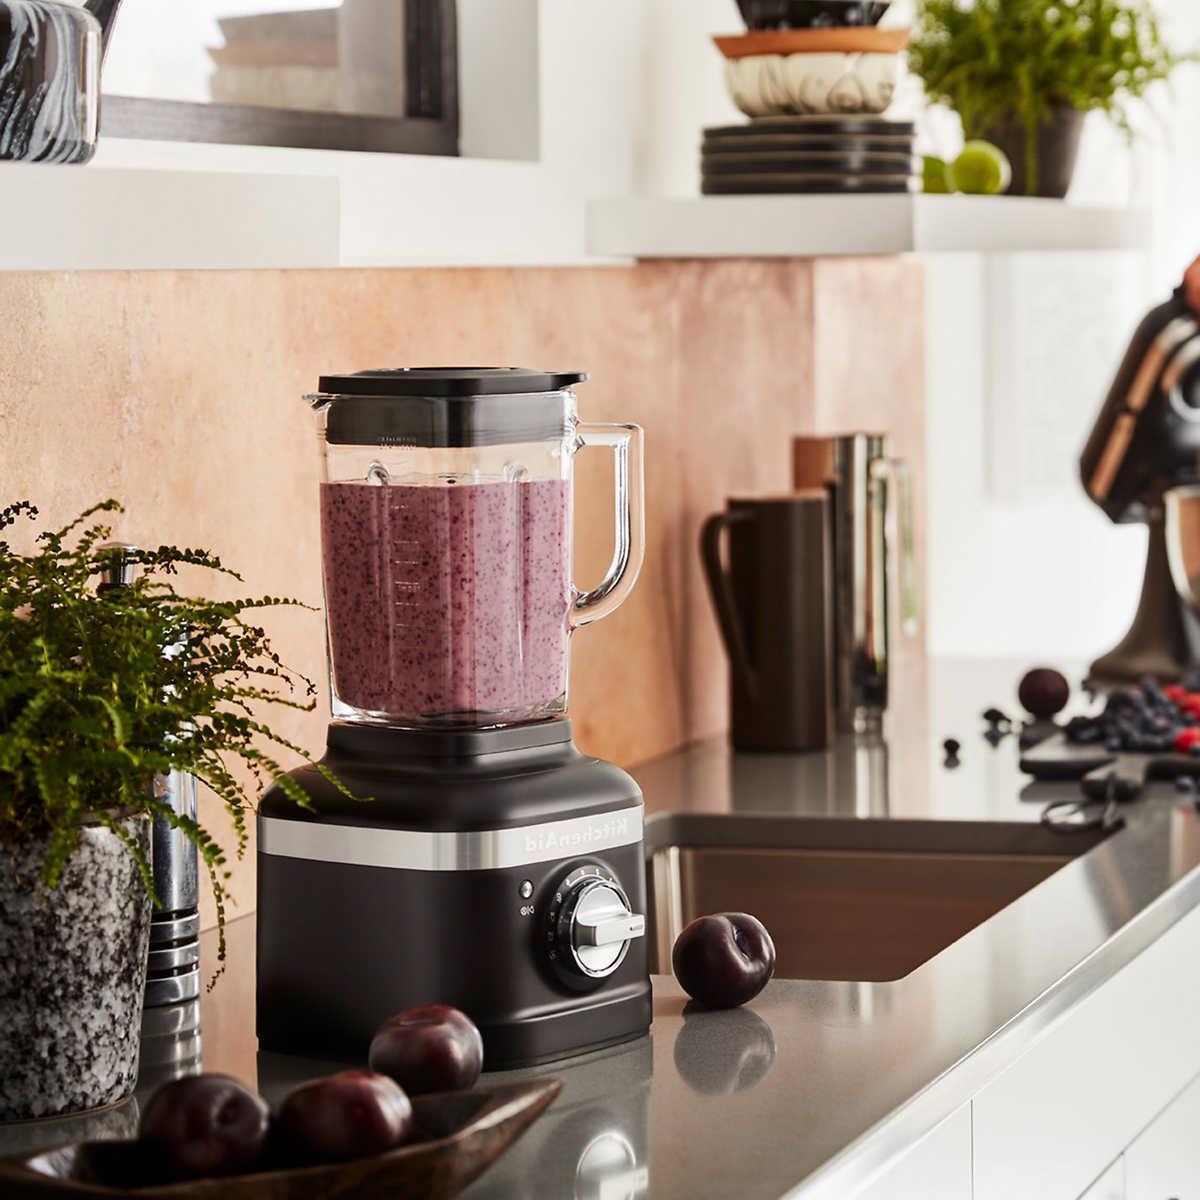 KitchenAid Blender with Personal Jar Black Color